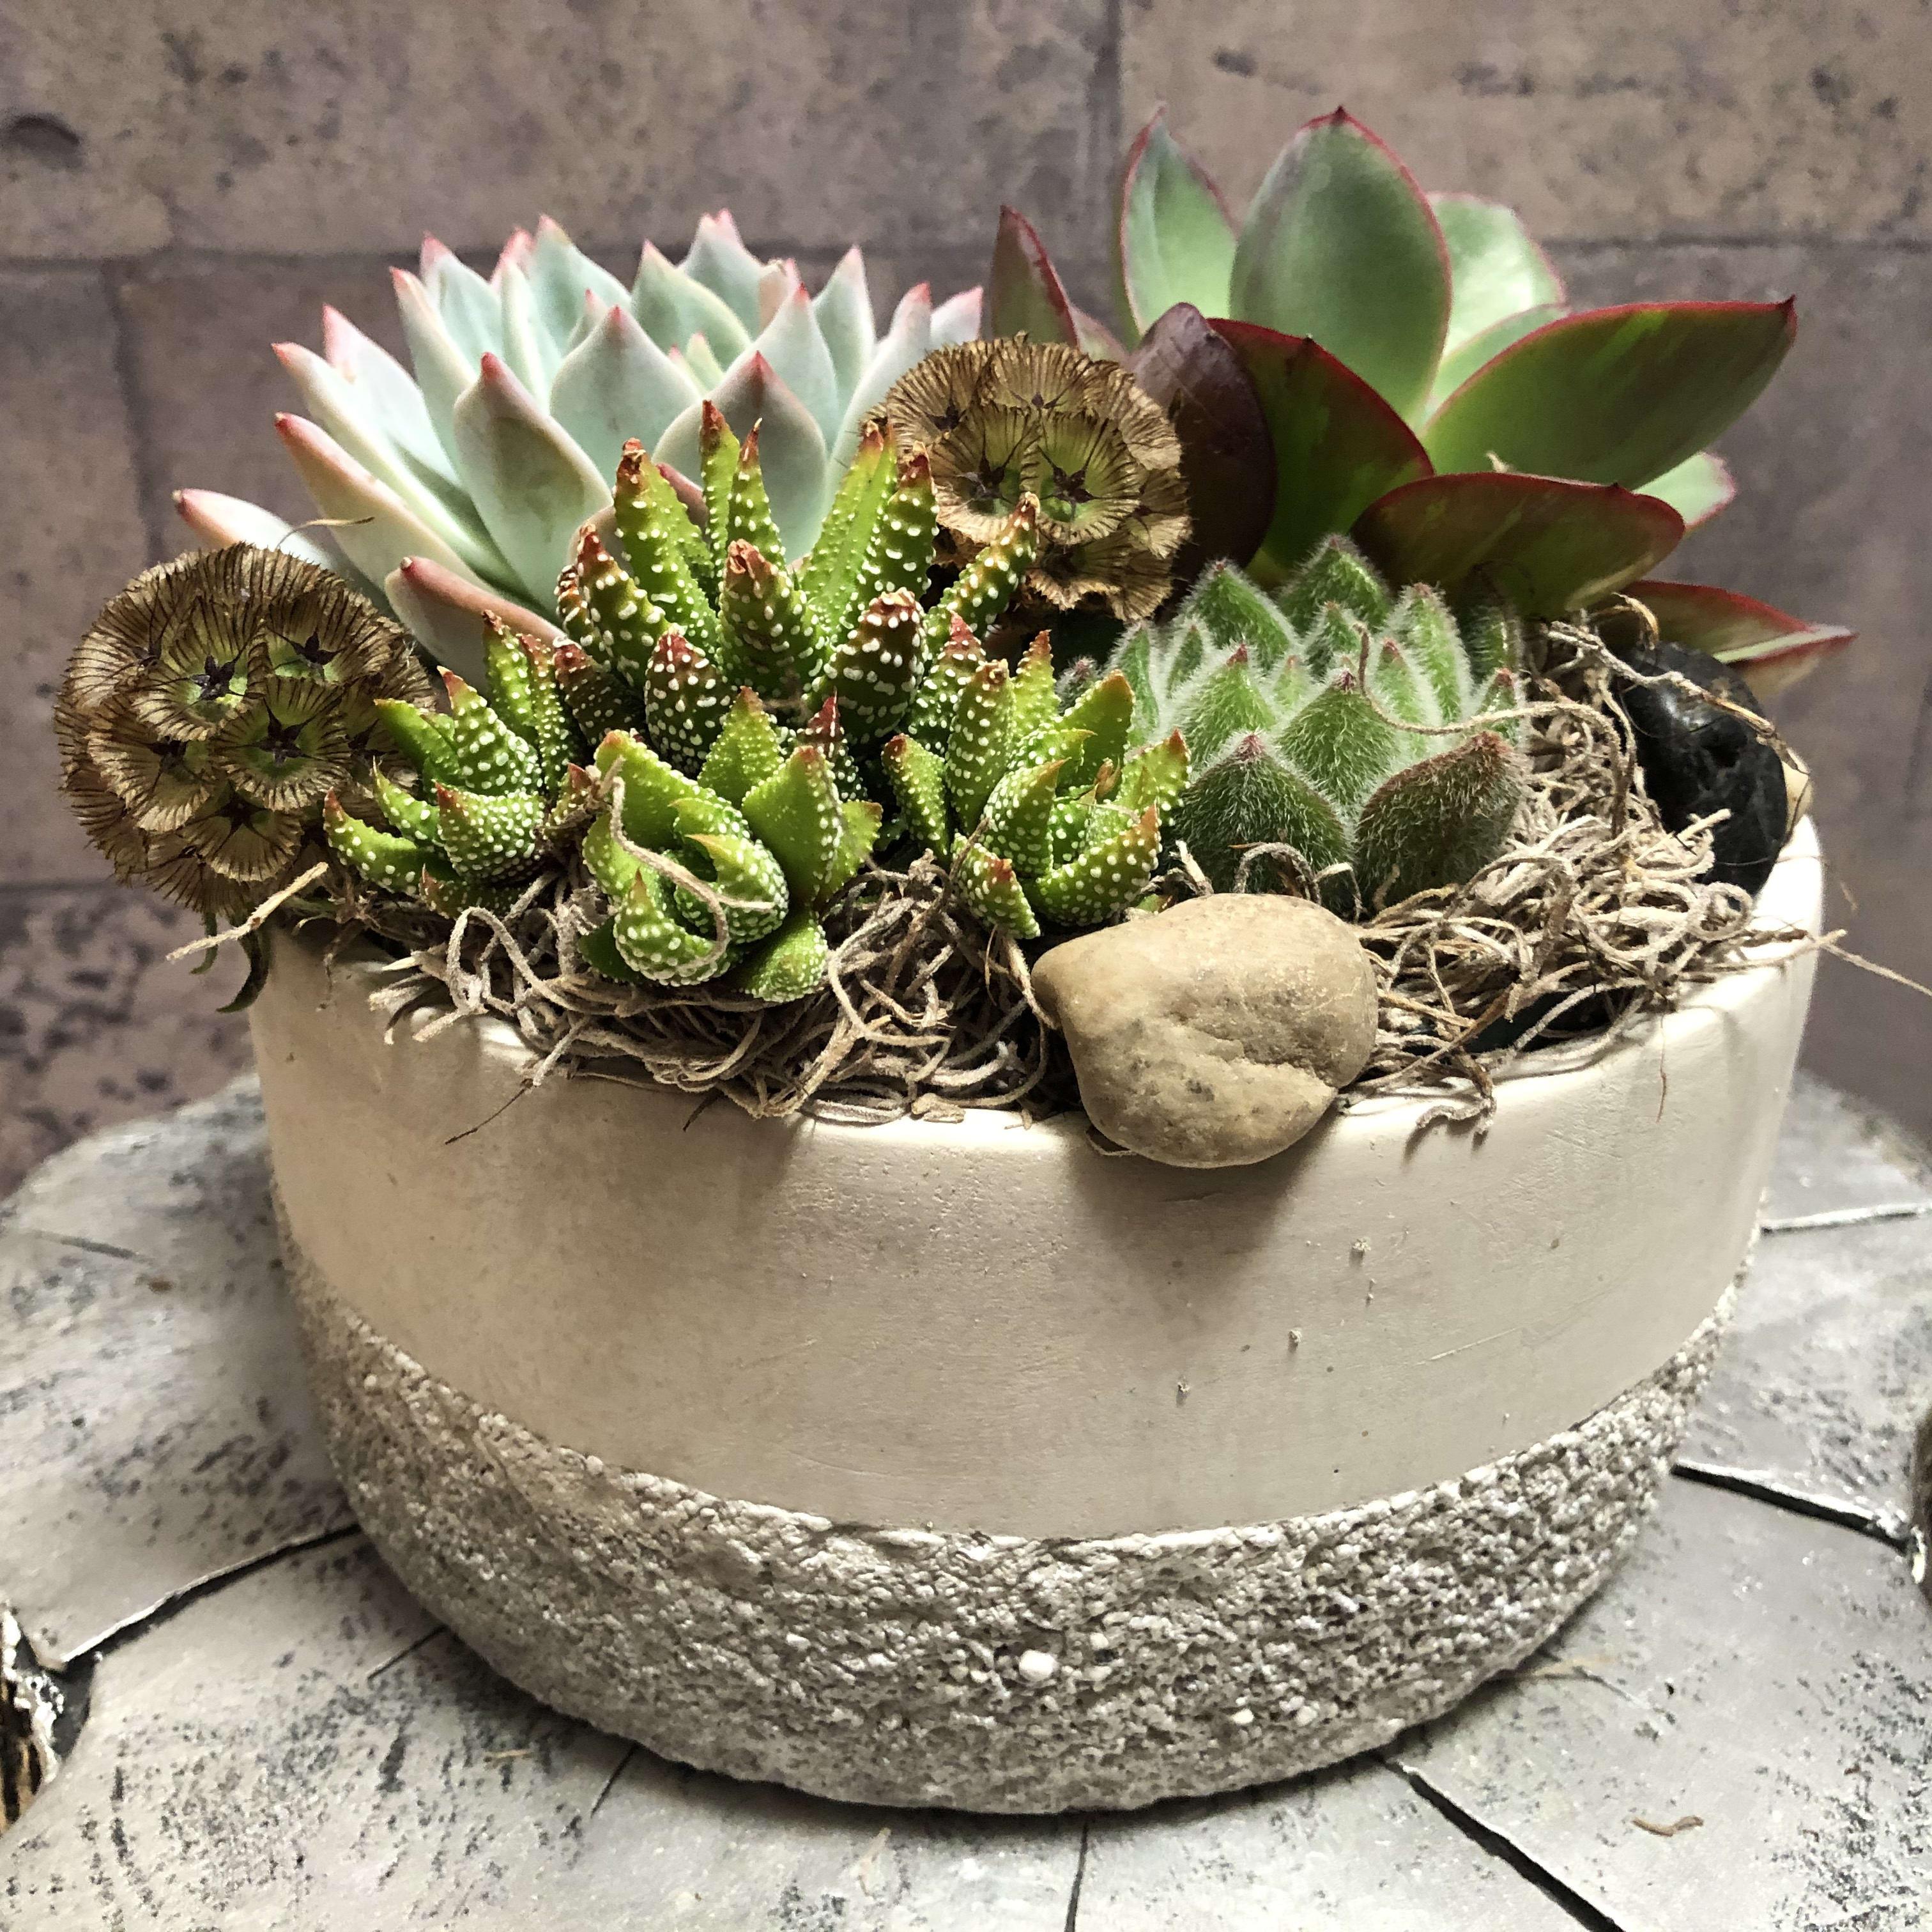 Echerevia Airplant Terrarium In Trophy Club Tx House Of Flowers